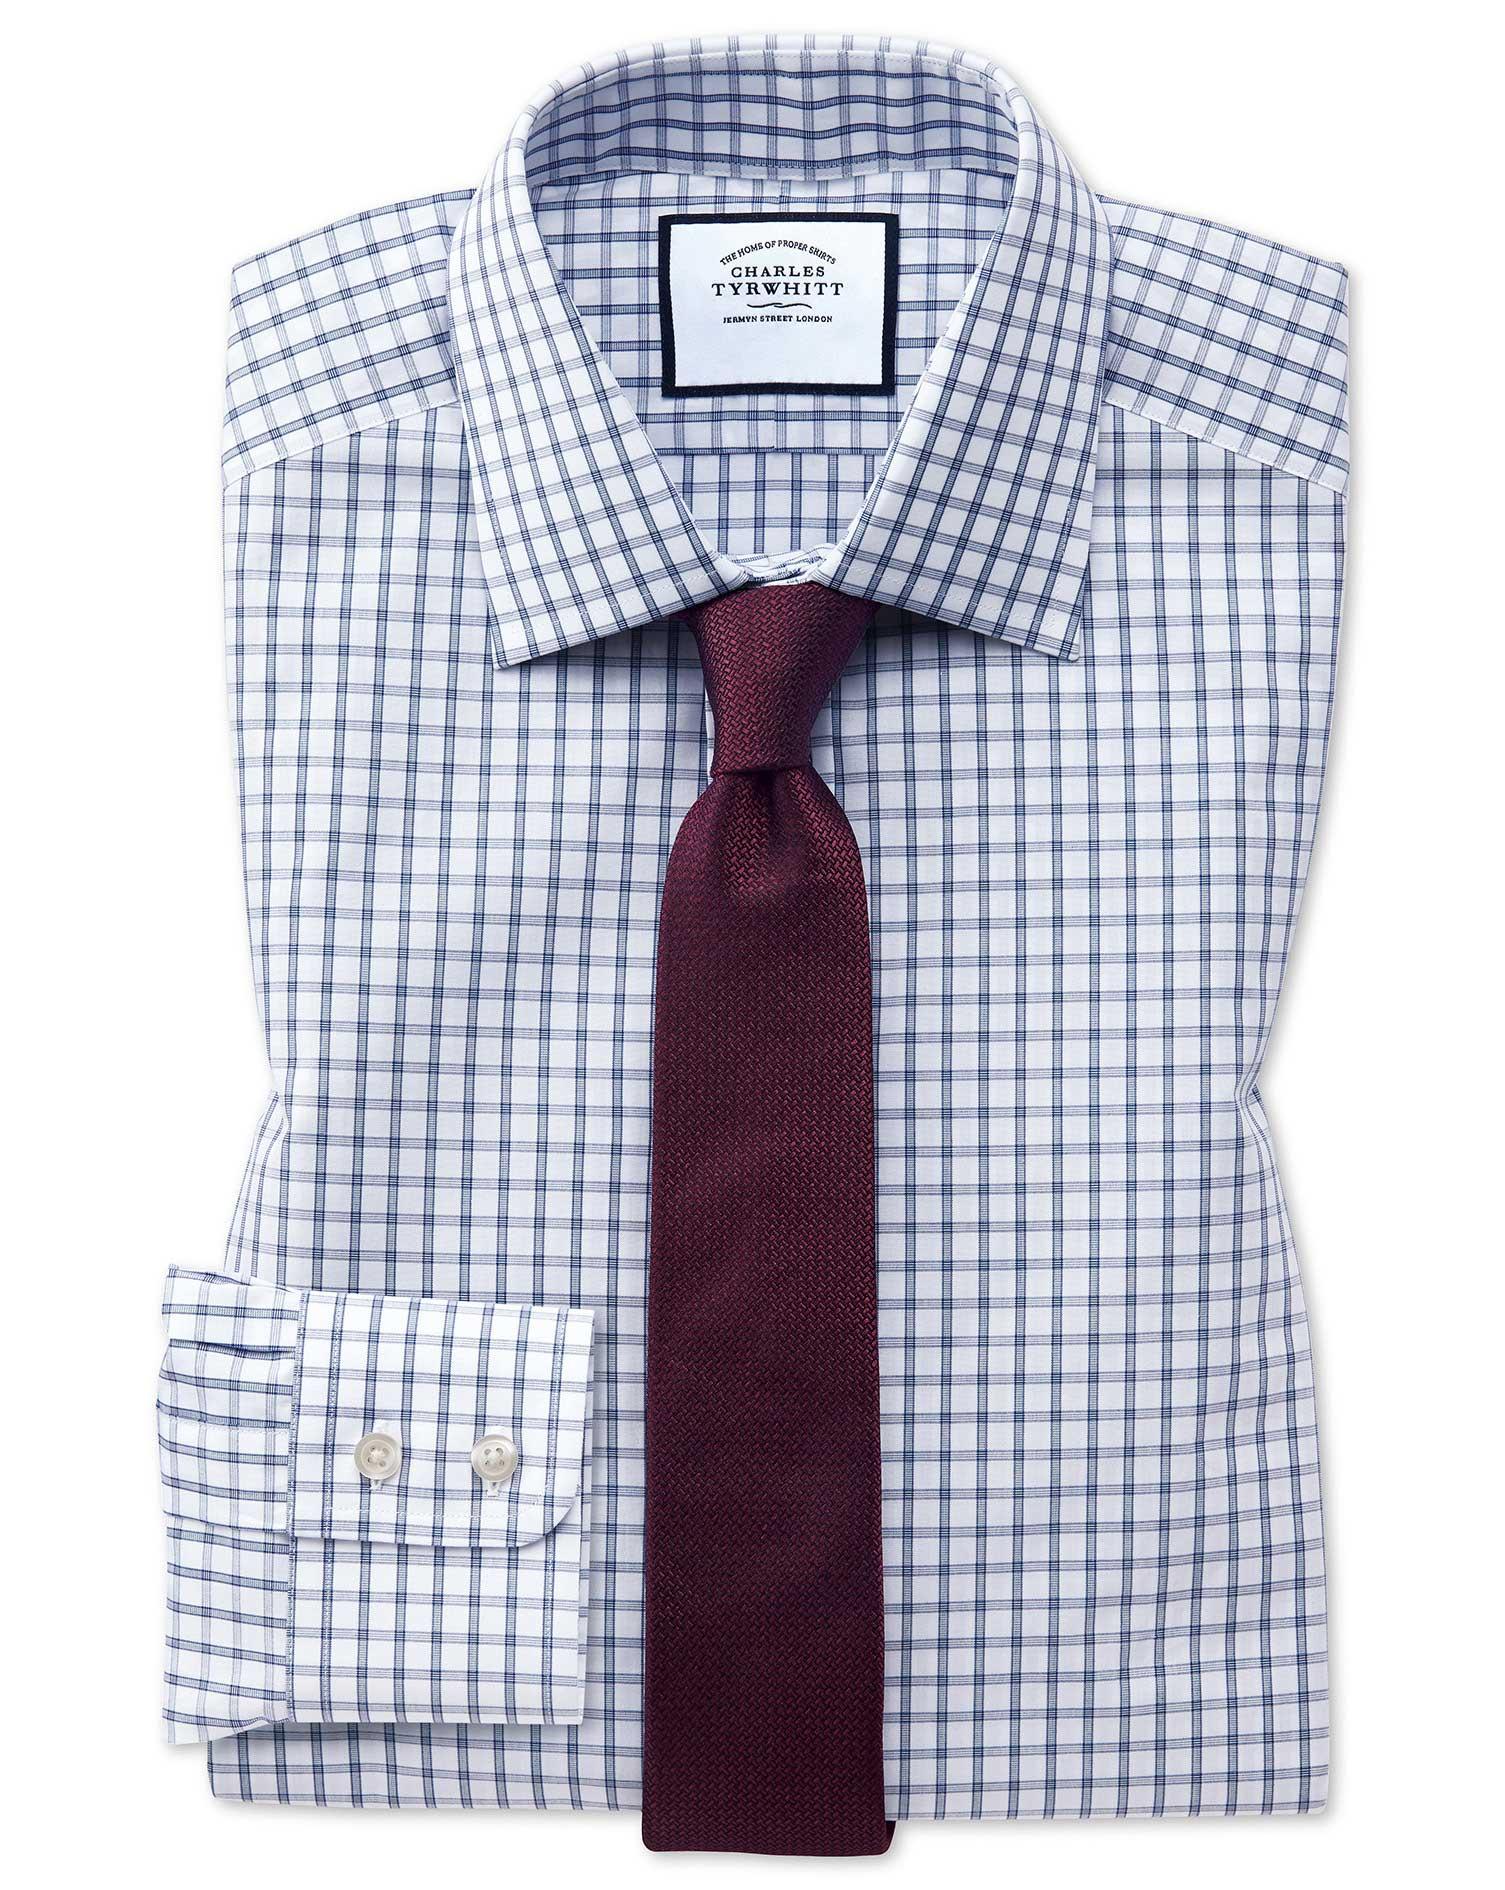 Extra Slim Fit Blue Windowpane Check Cotton Formal Shirt Single Cuff Size 16/36 by Charles Tyrwhitt